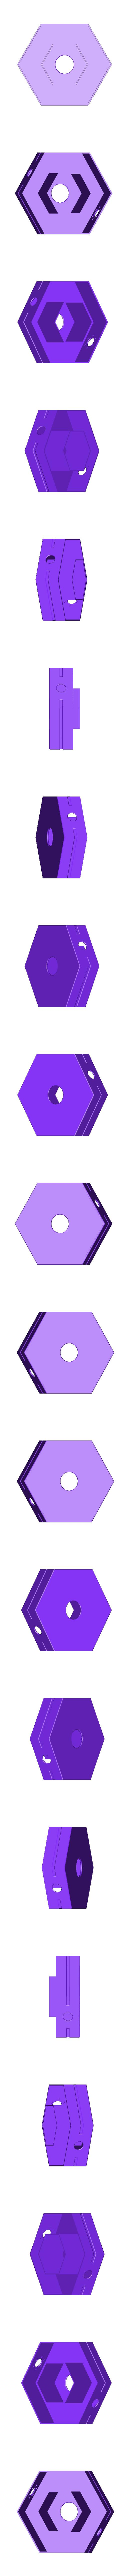 hexaspot_shade.stl Download free STL file HexaSpot Lamp v1 • 3D printing object, marigu